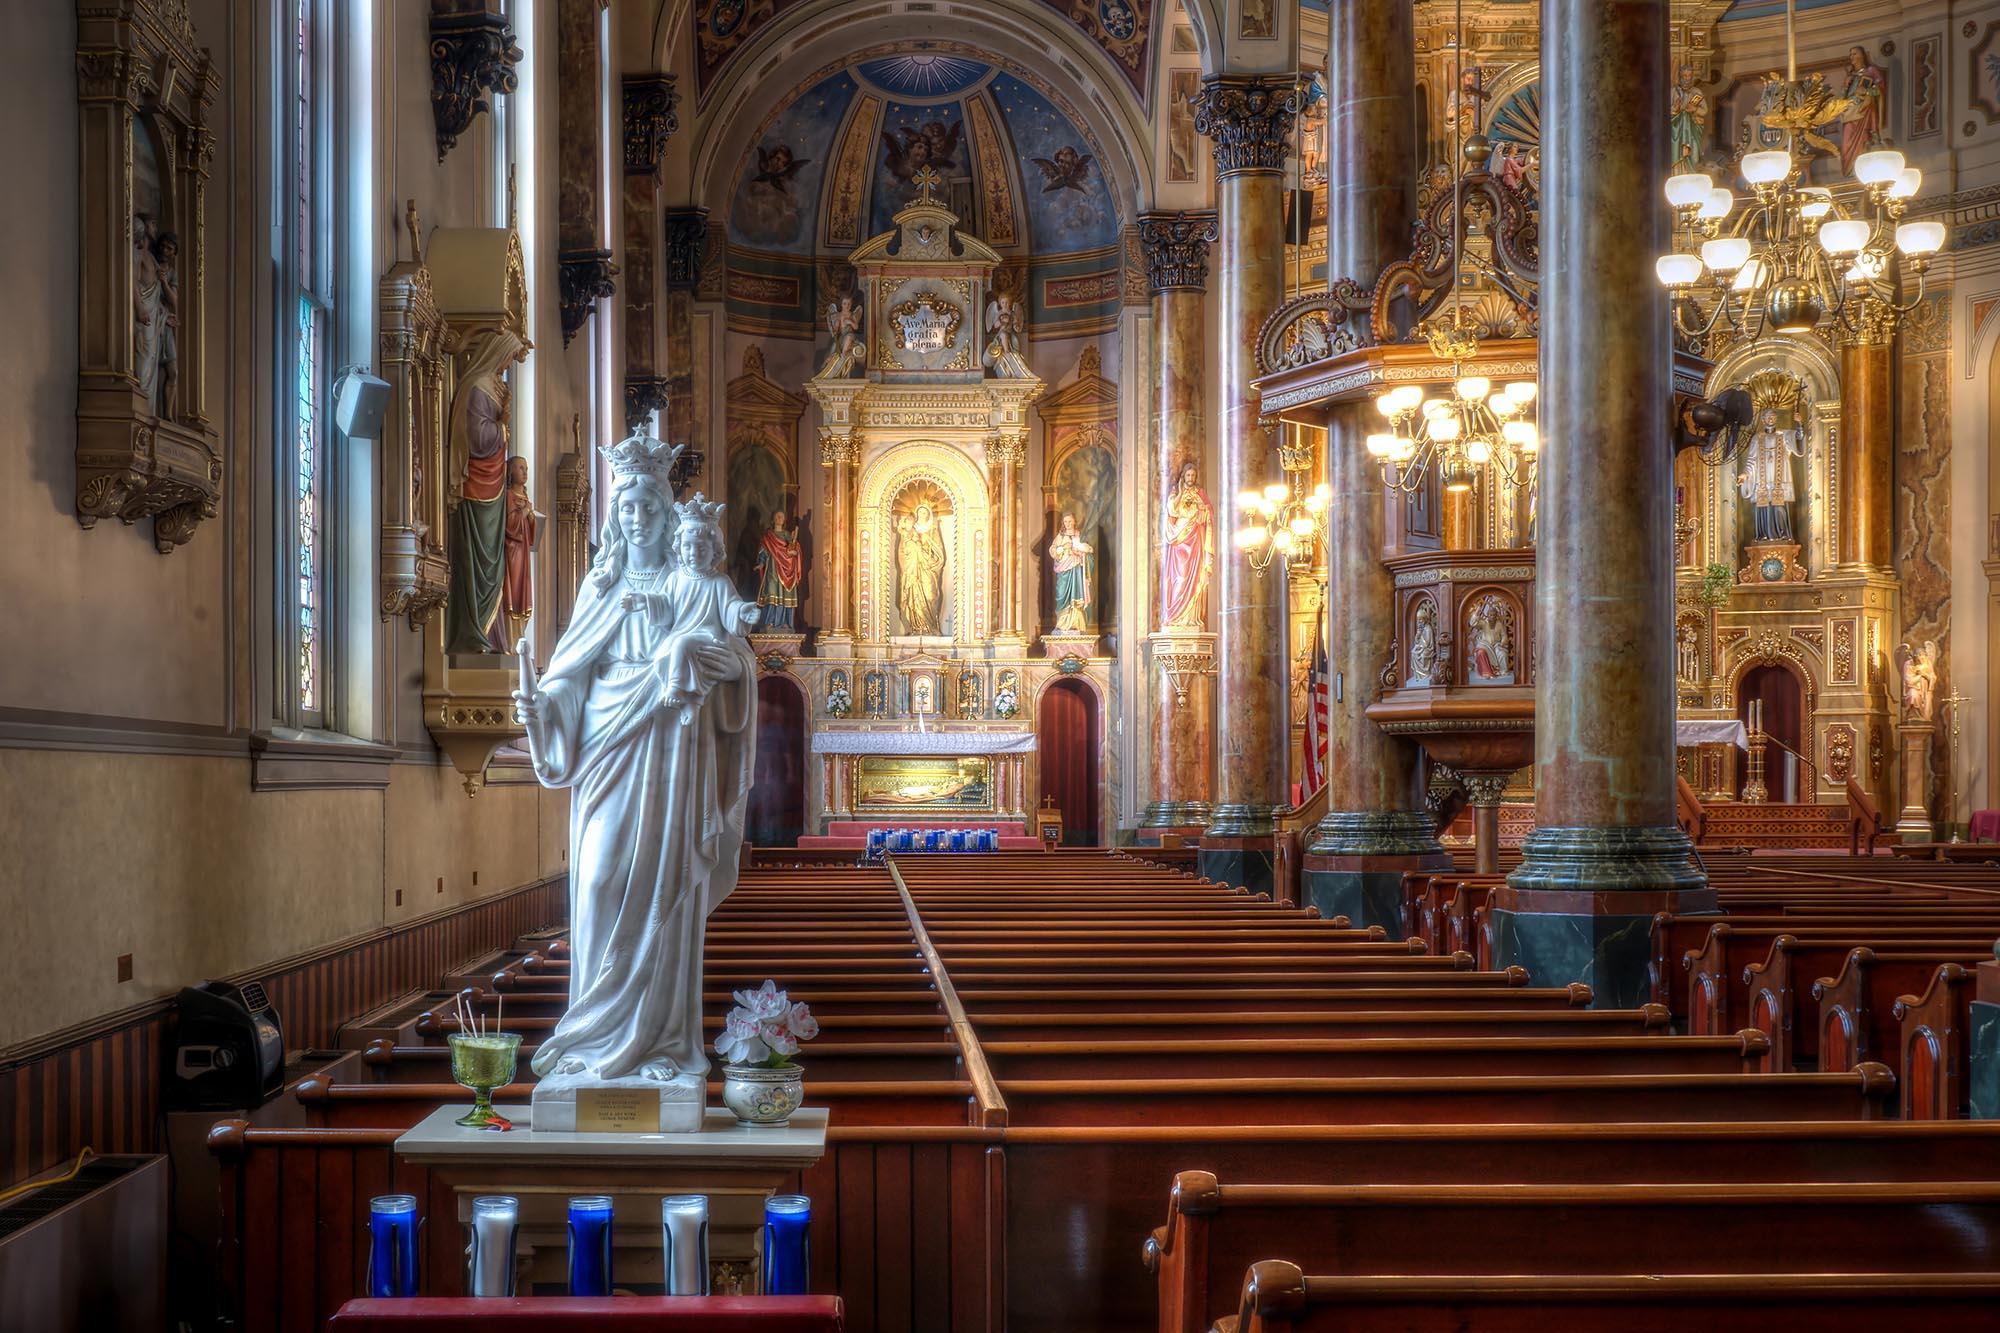 Shrine of St. Joseph Church, St. Louis, Missouri - Mark_Polege